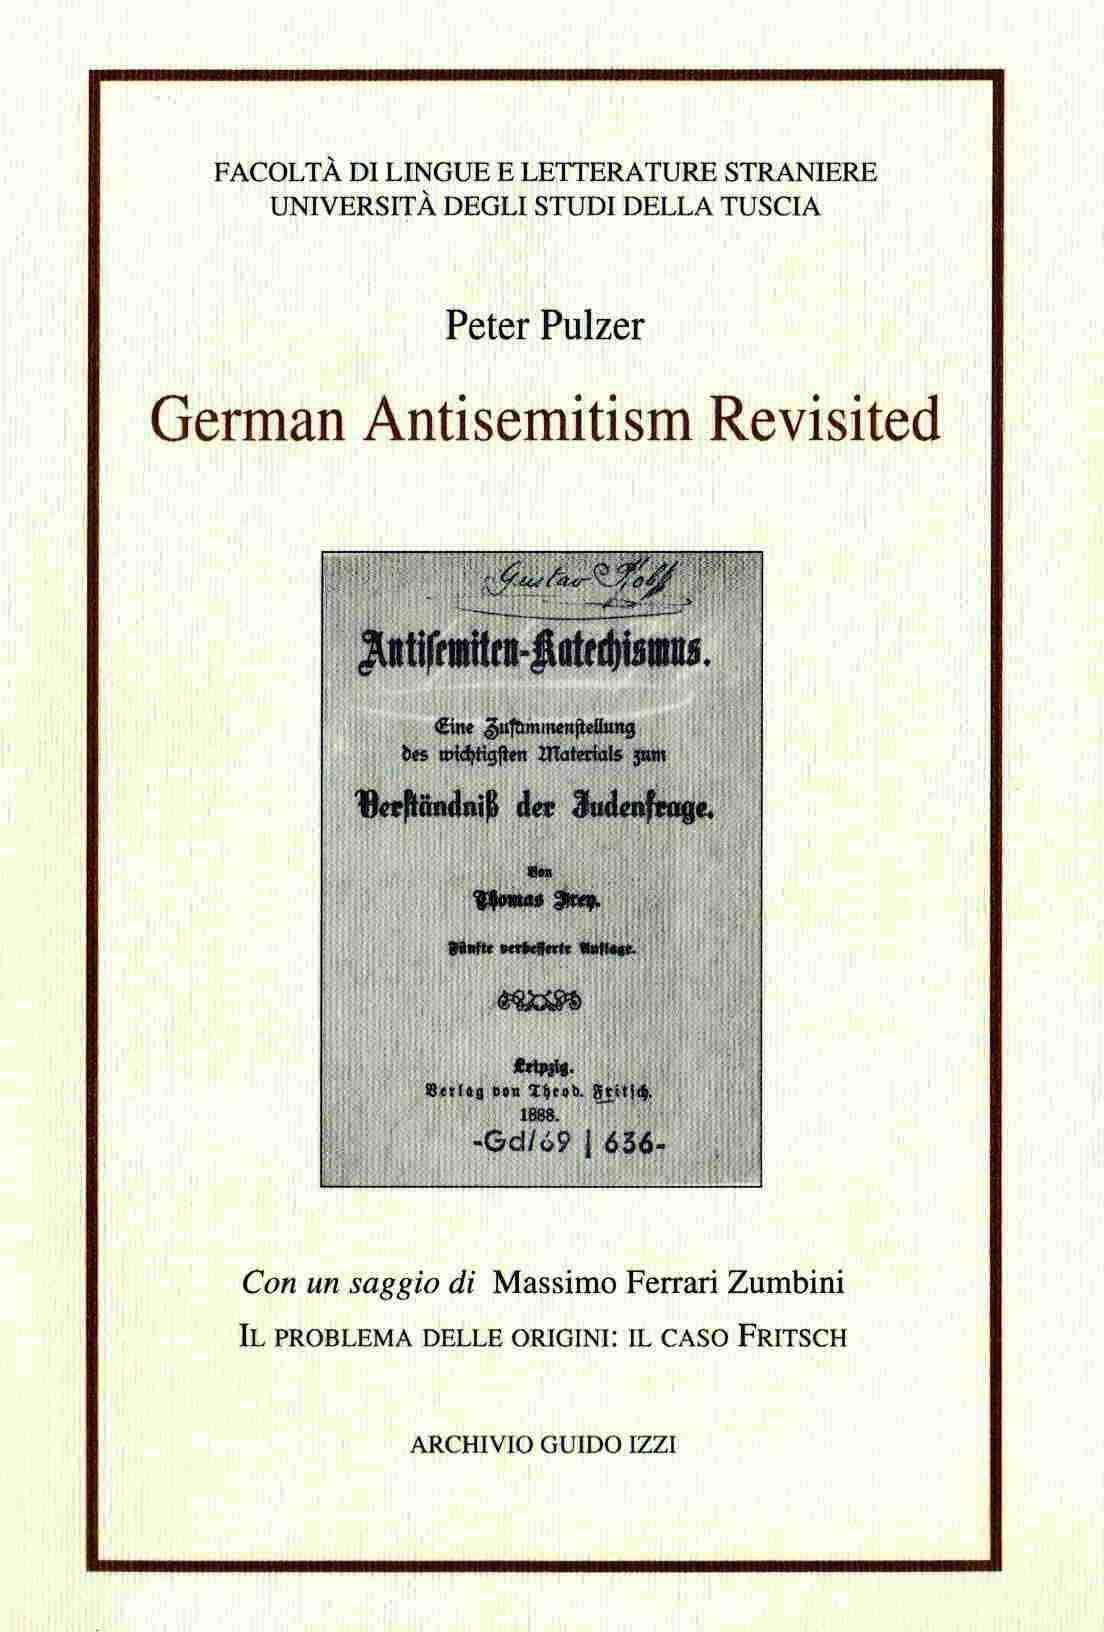 German antisemitism revisited